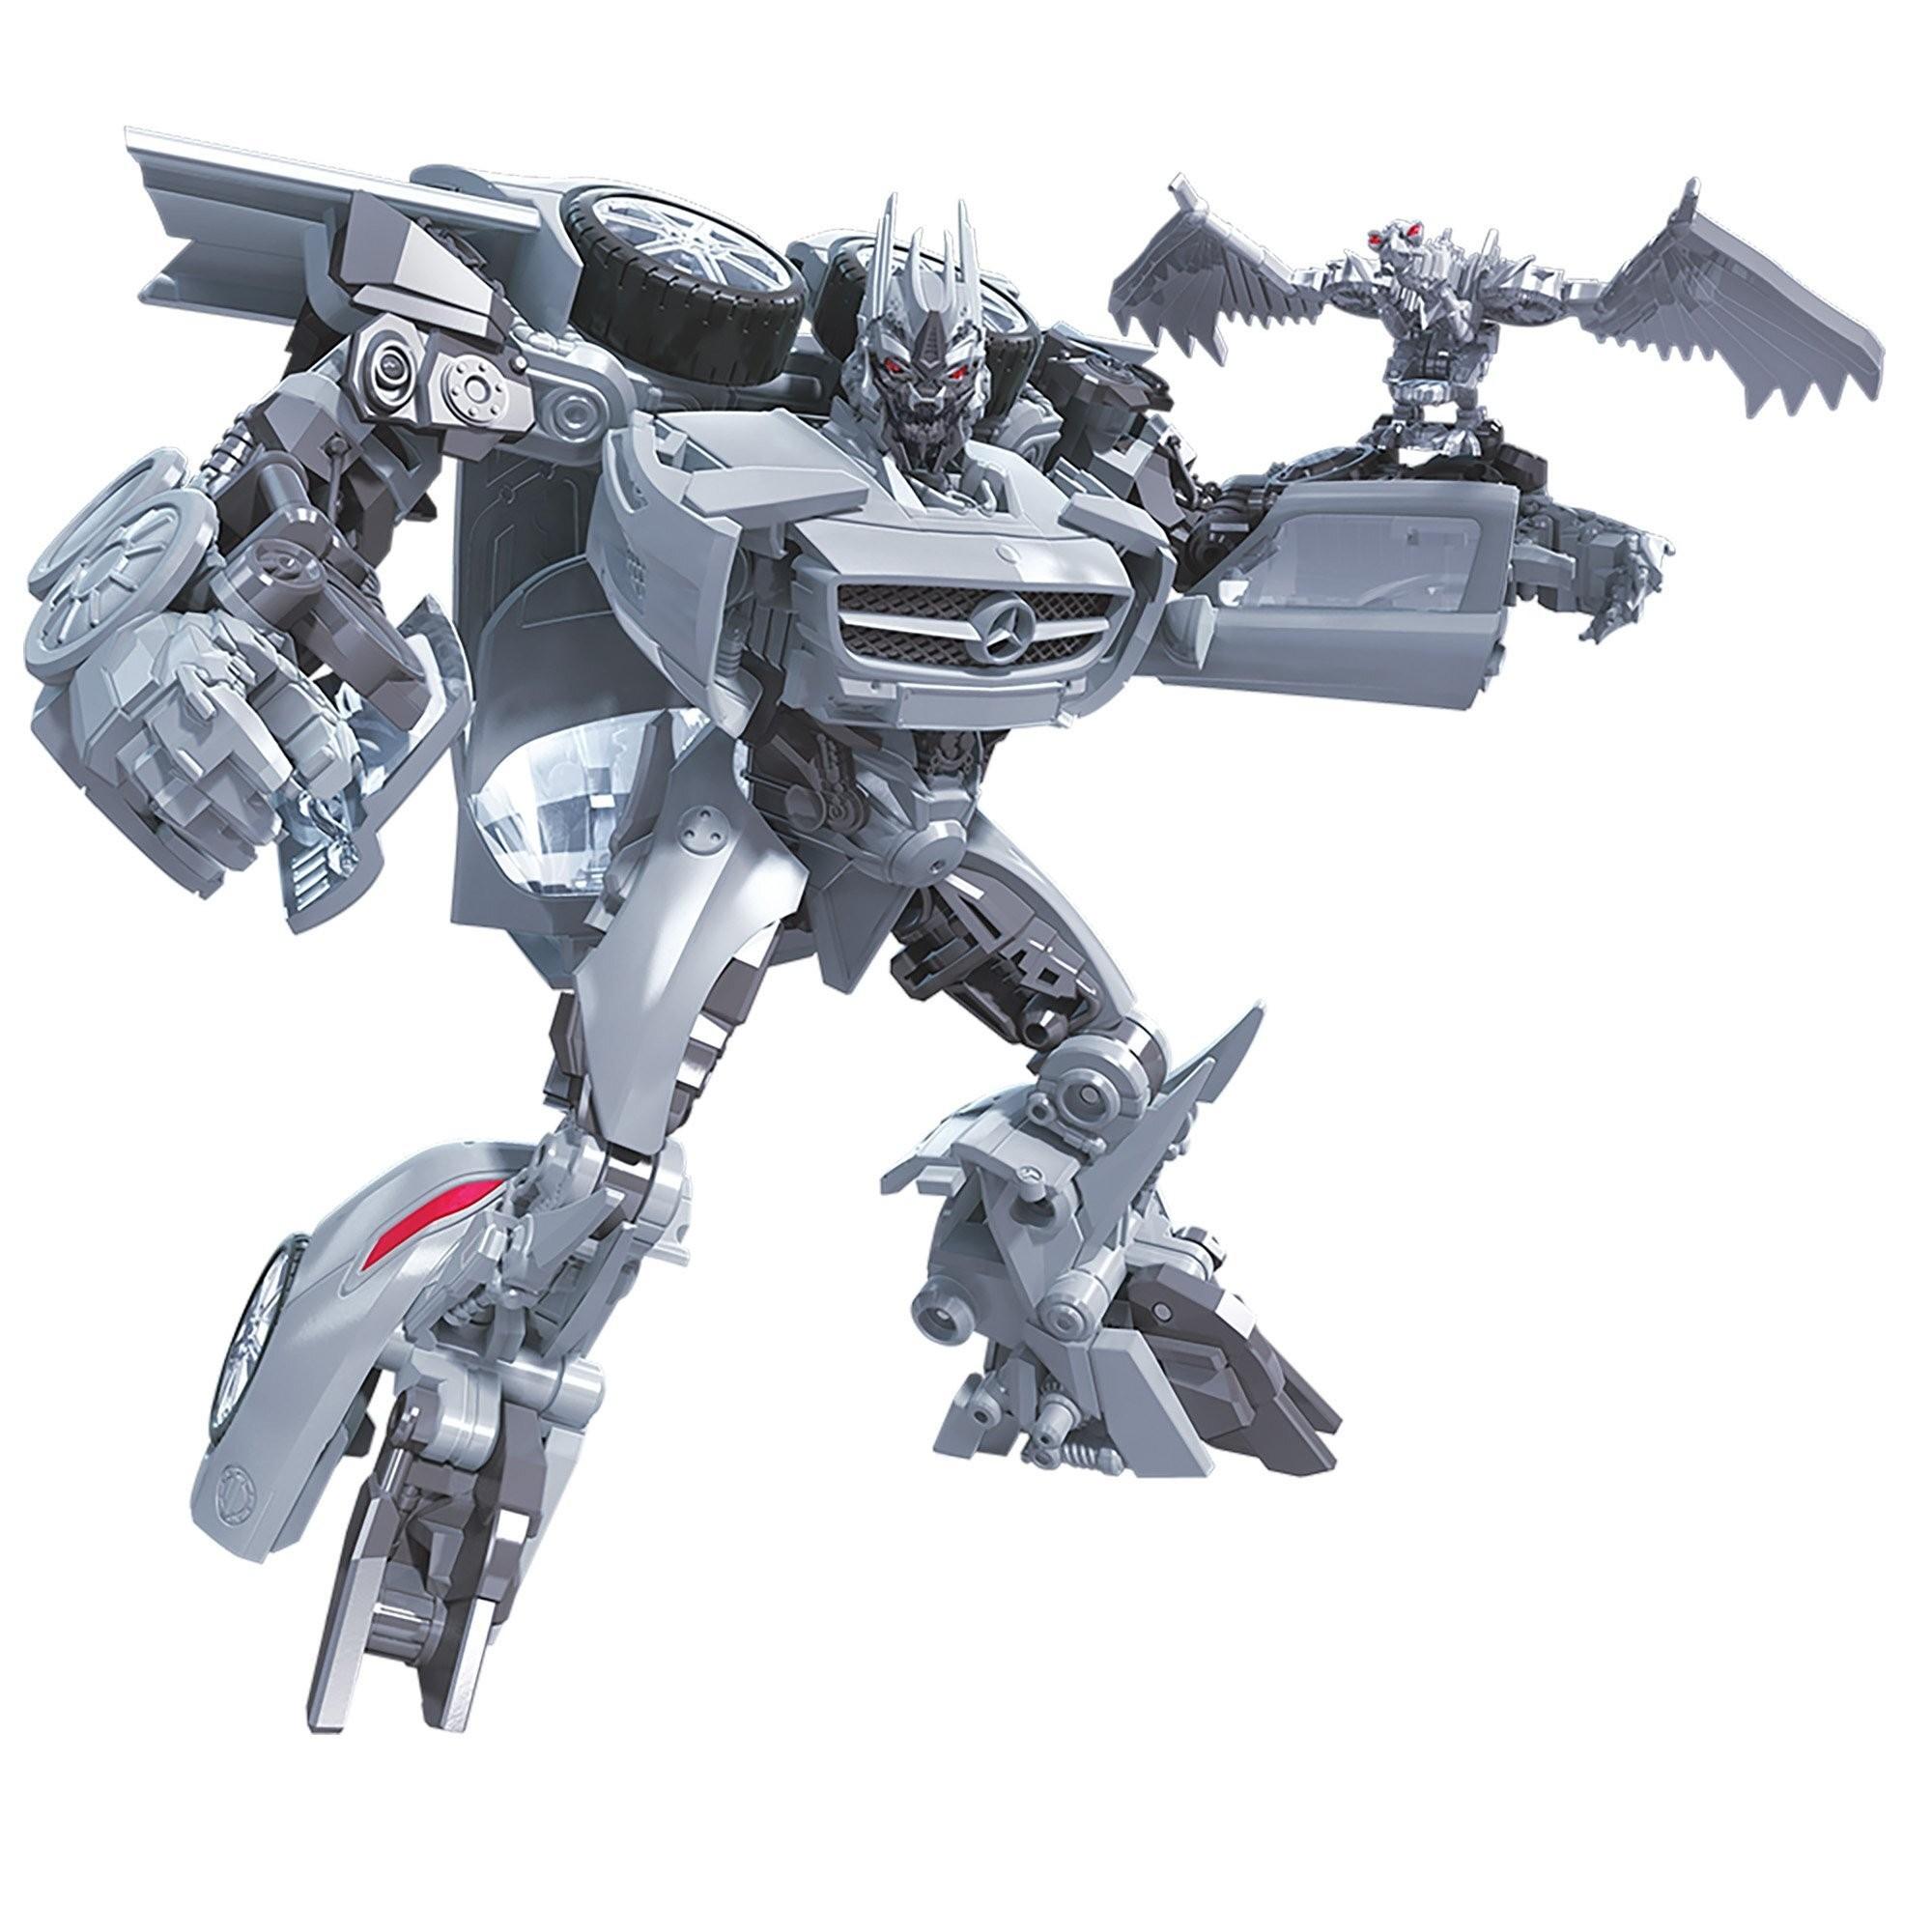 Studio Transformers Laserbeak Soundwaveamp; Deluxe Series xBWrdCeo